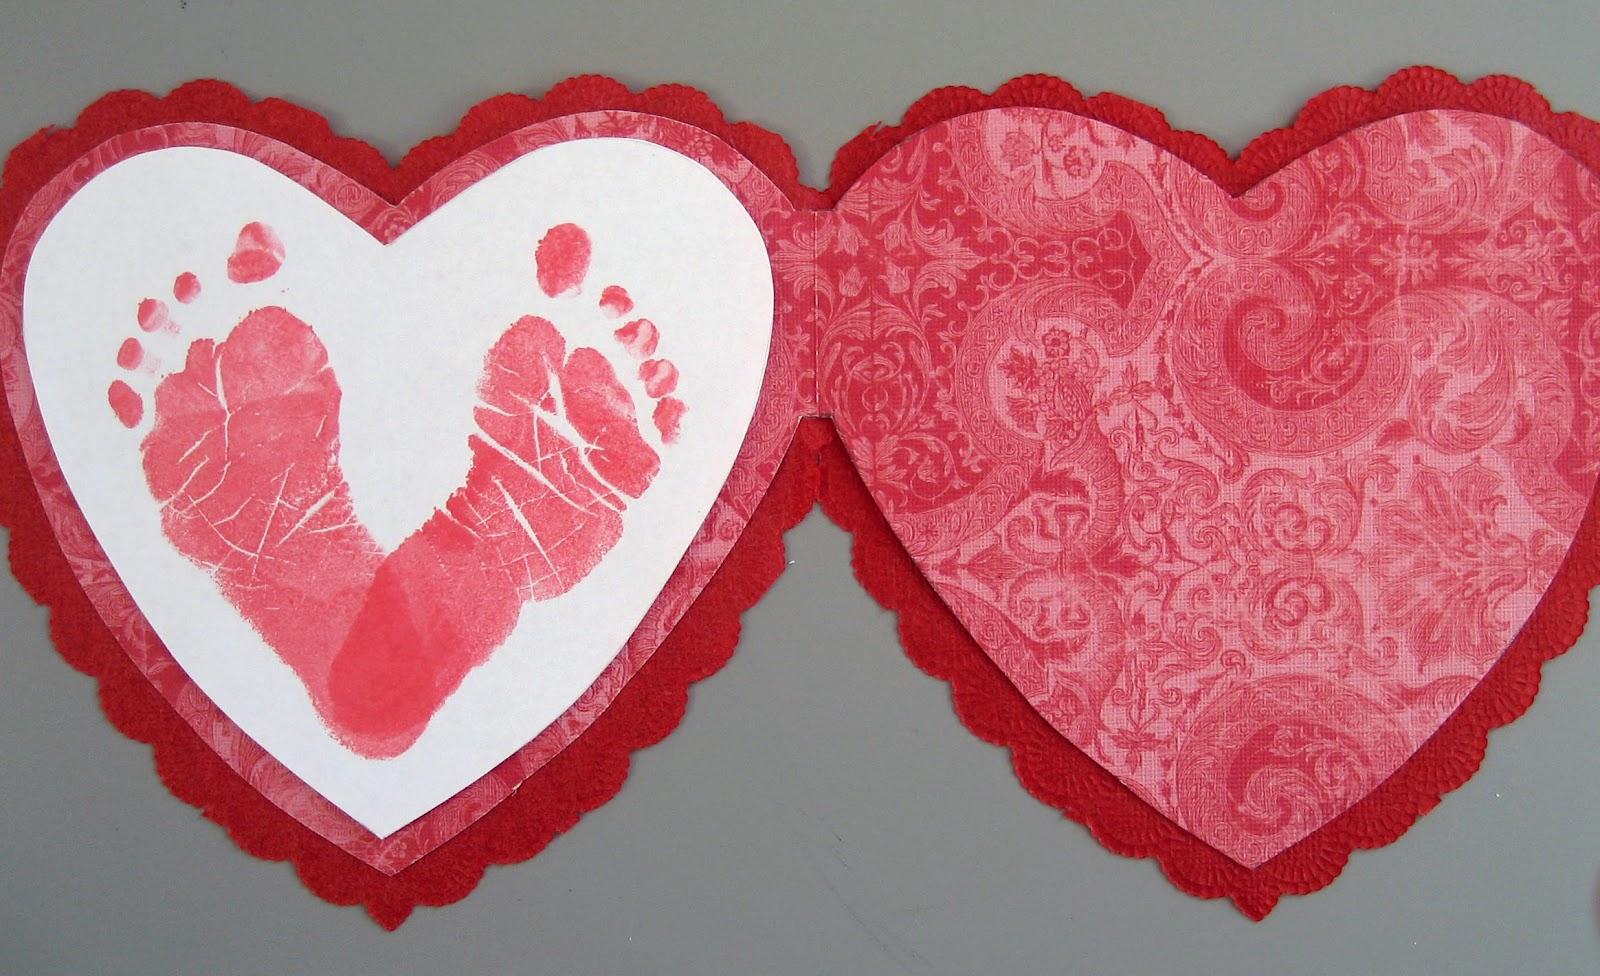 preschool crafts for kids valentine's day footprint card